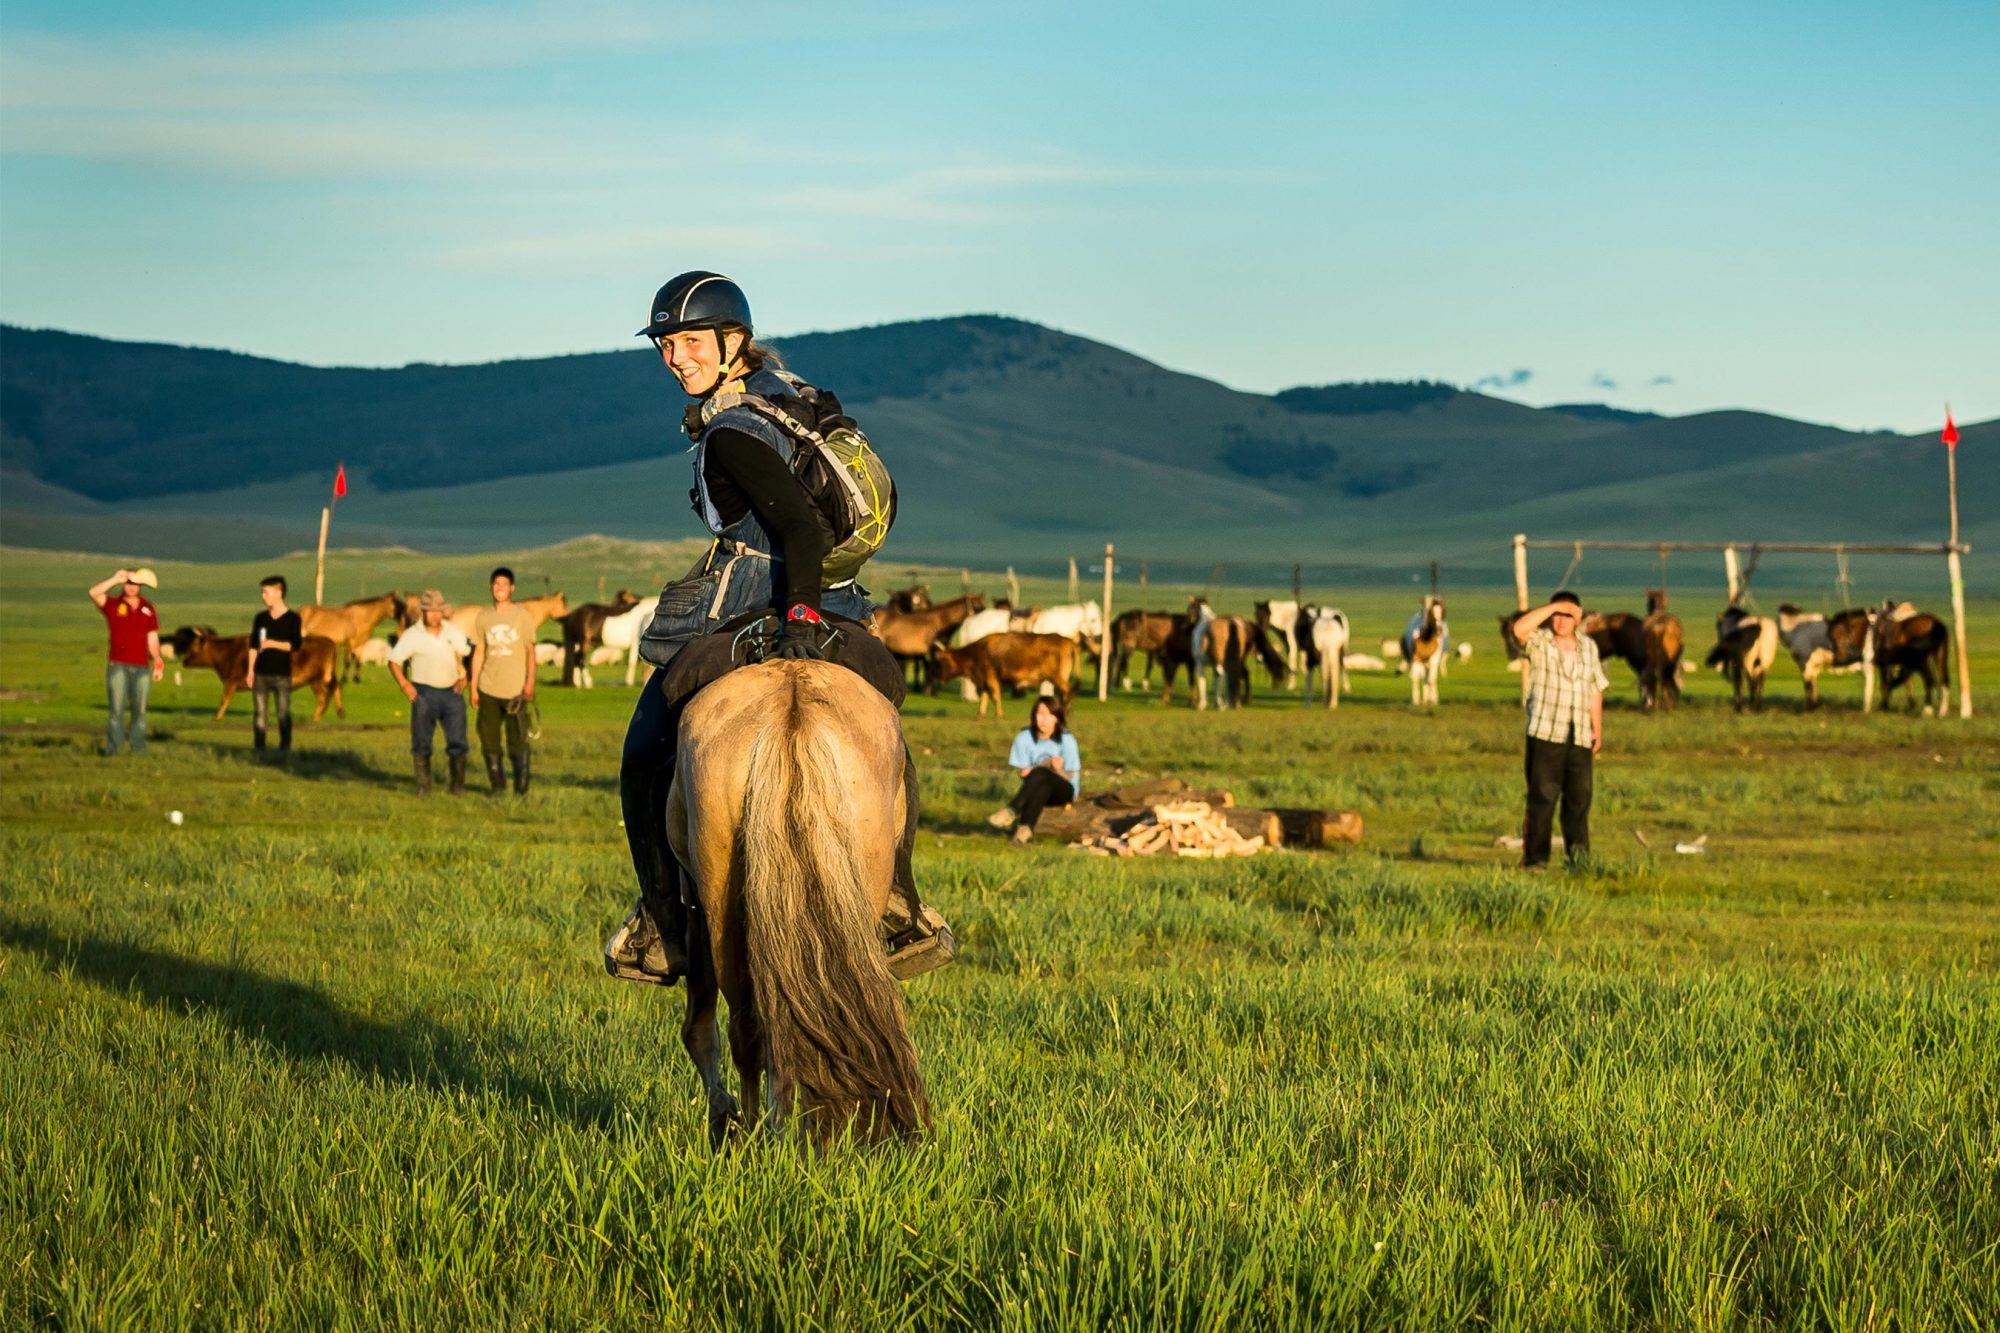 Lara Prior-Palmer on horse looking back - photography credit Richard Dunwoody